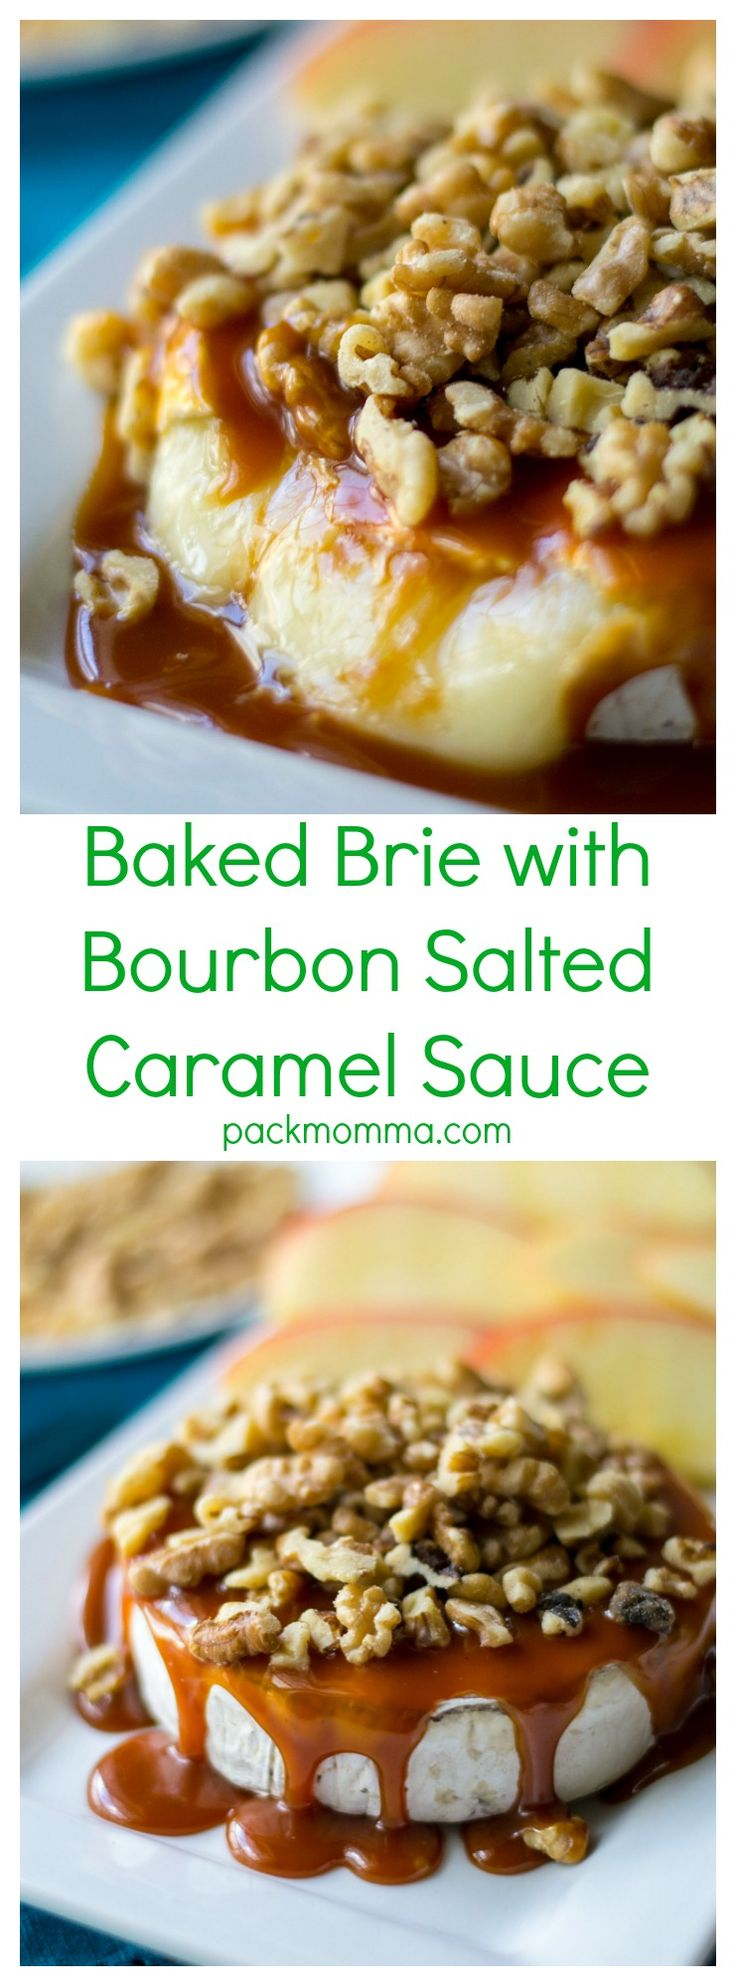 Best 25+ Brie bites ideas on Pinterest | Brie appetizer ...